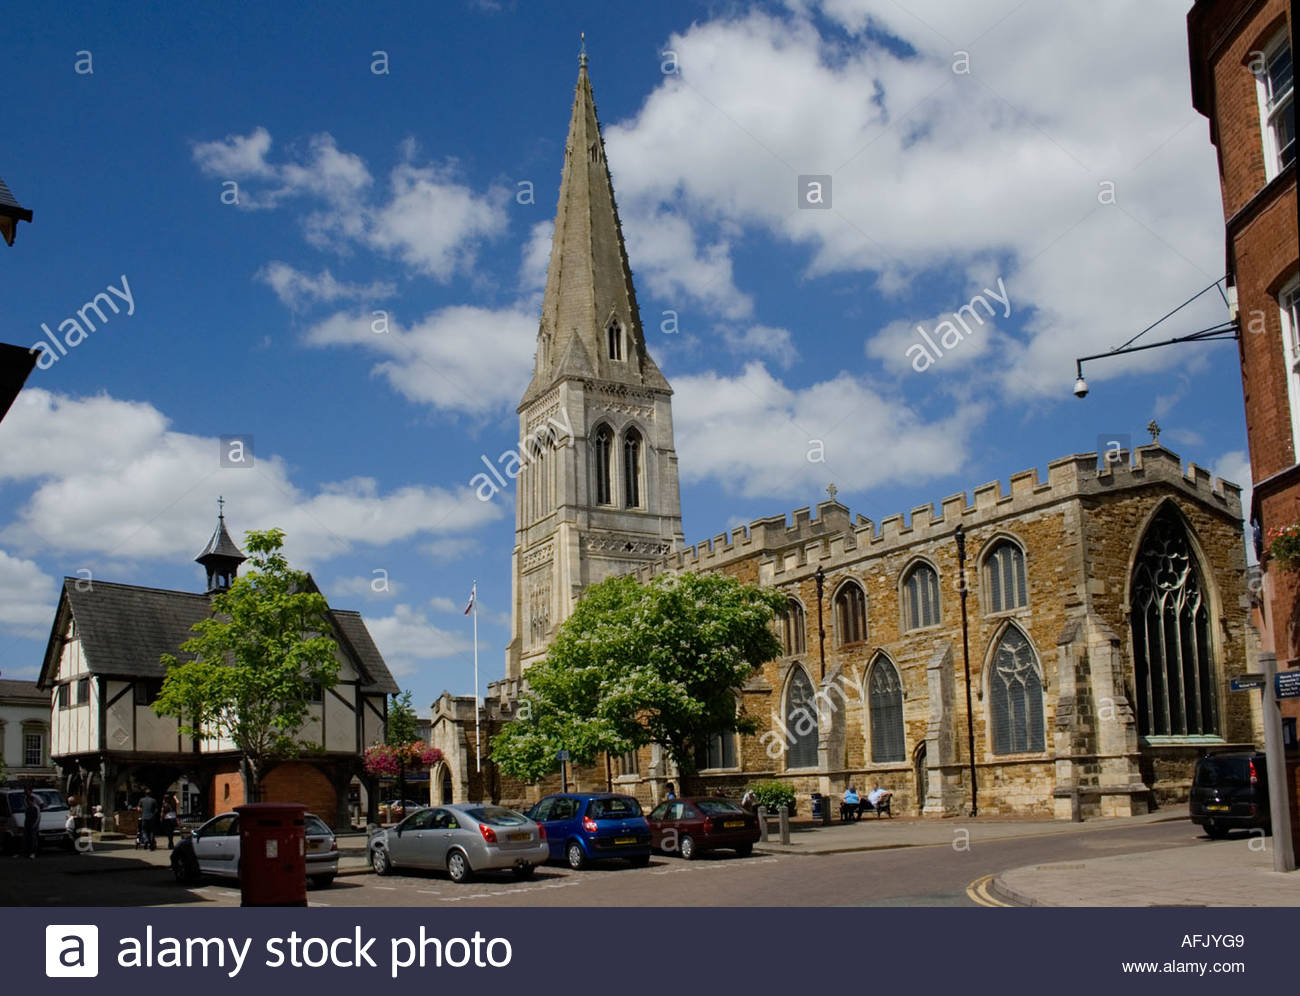 Market Harborough Church - Stock Image